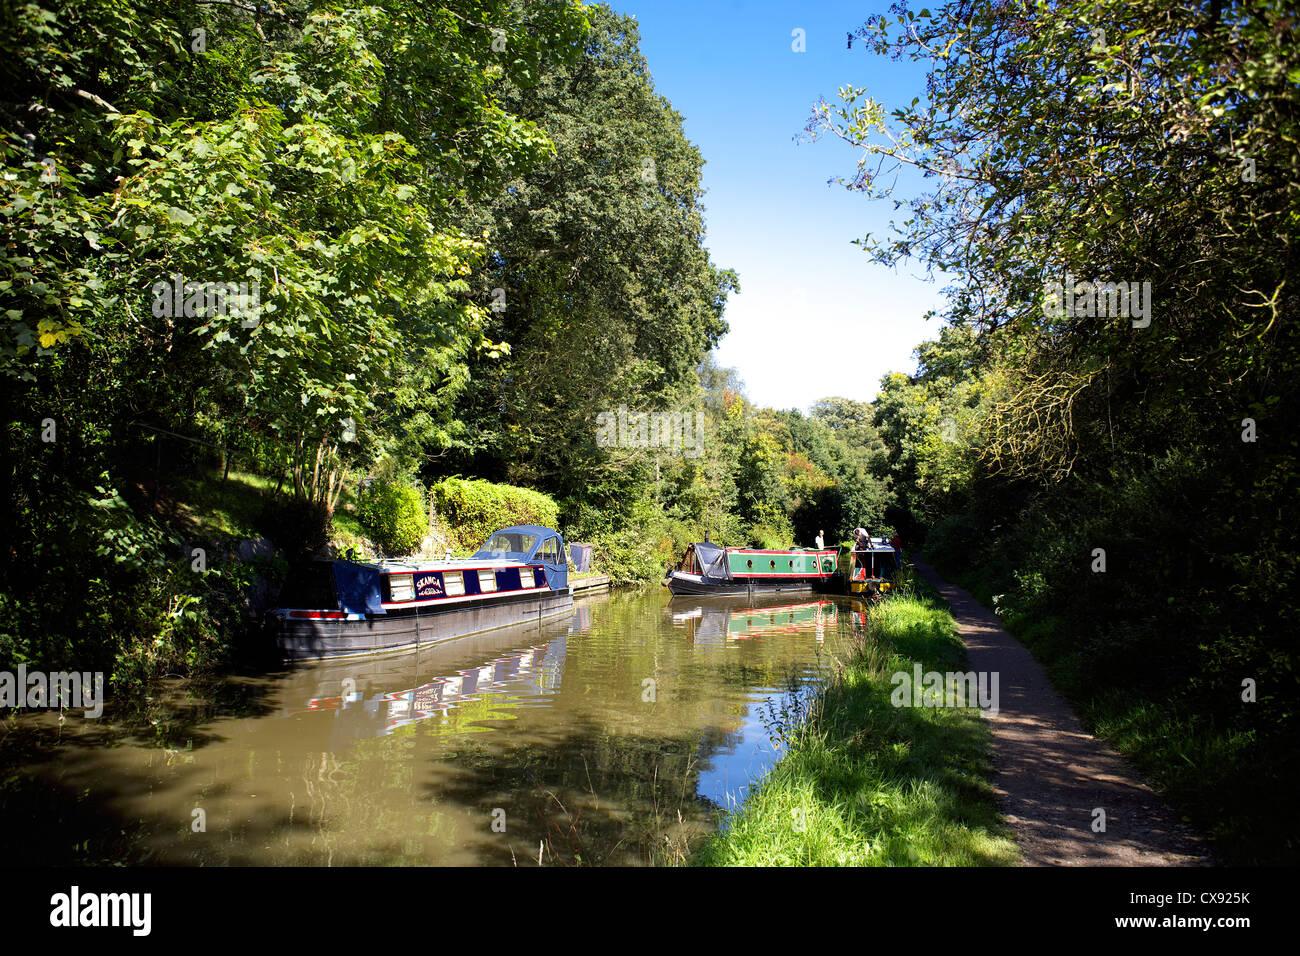 Narrowboats on the Grand Union Canal, Warwickshire, England, UK, narrow, boat, boats, boating, narrowboat, narrowboats, - Stock Image